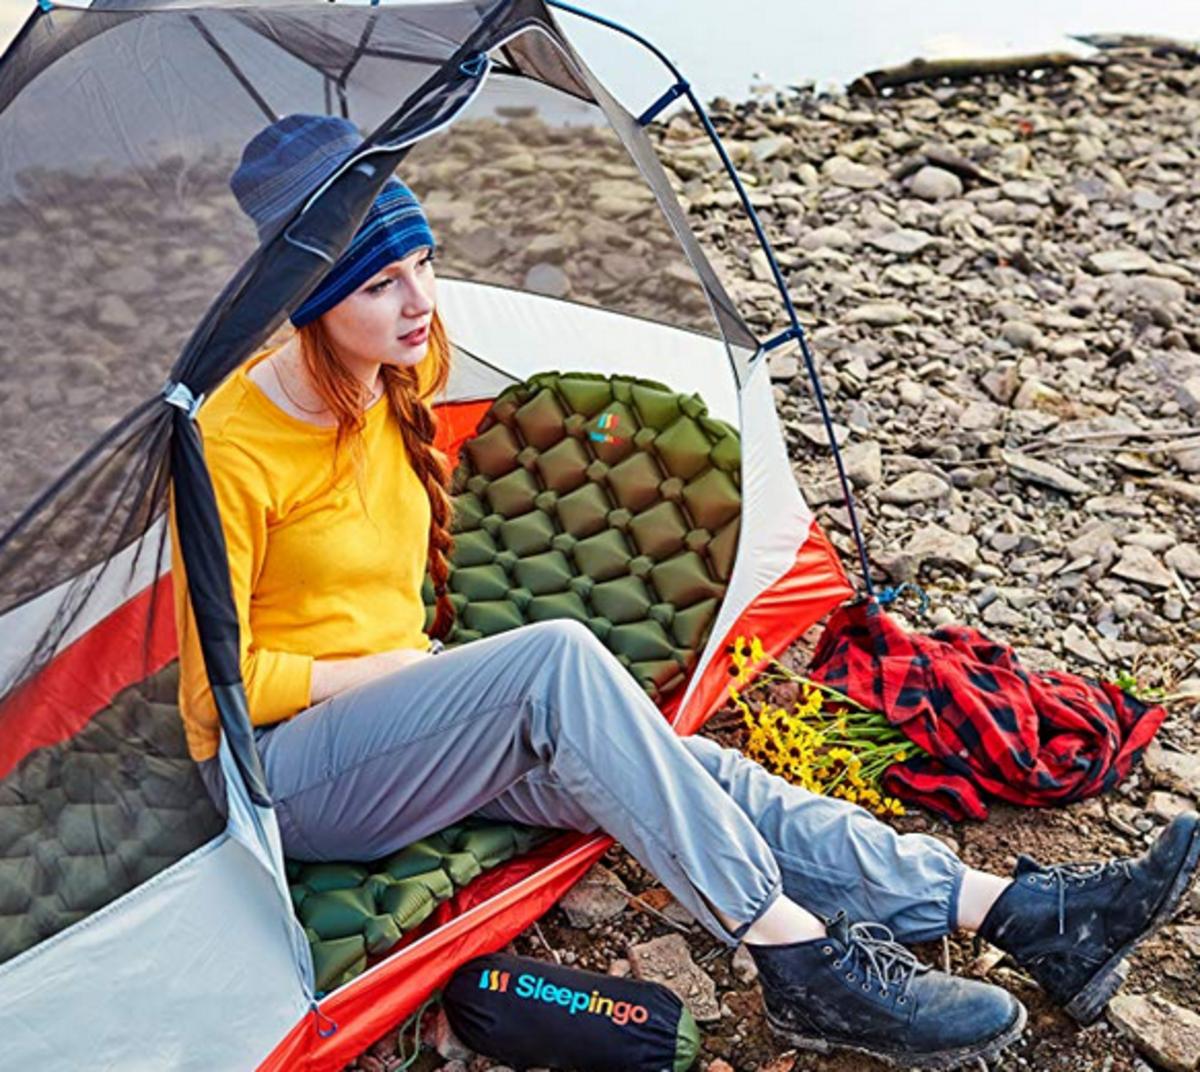 Sleepingo makes a pretty amazing camping mattress